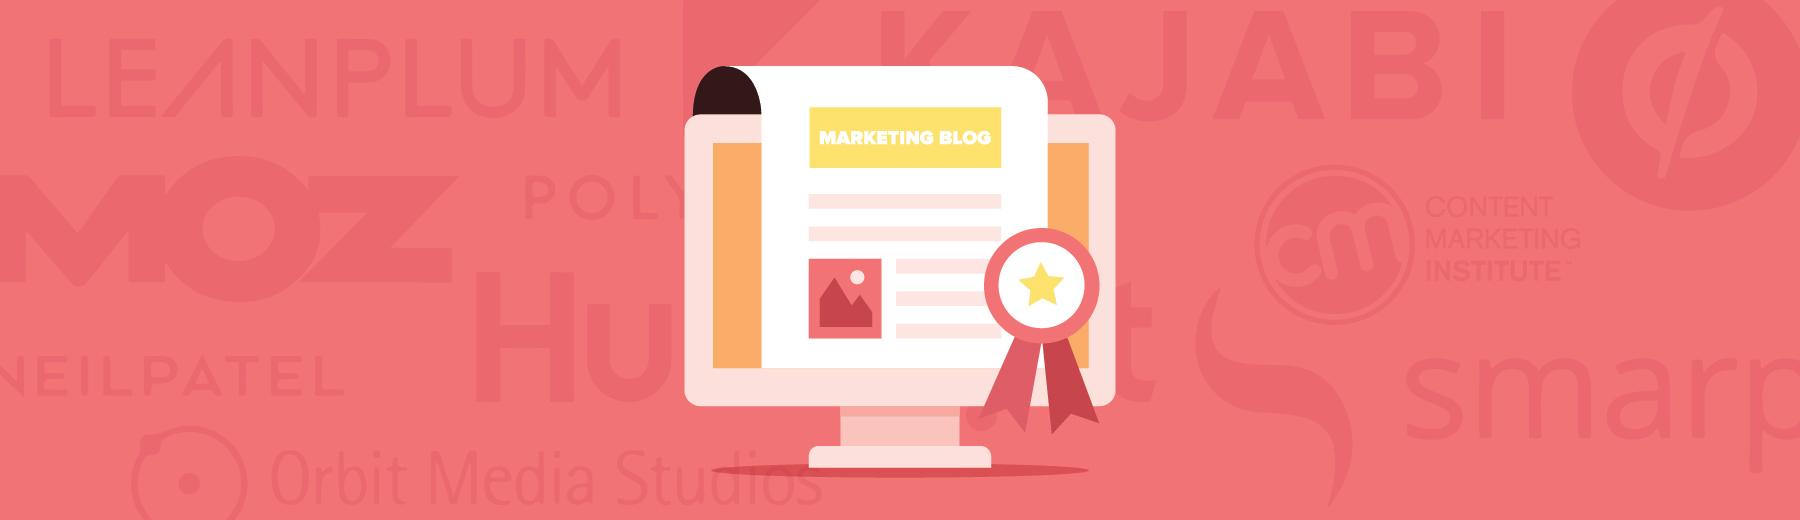 13 best marketing blogs to follow